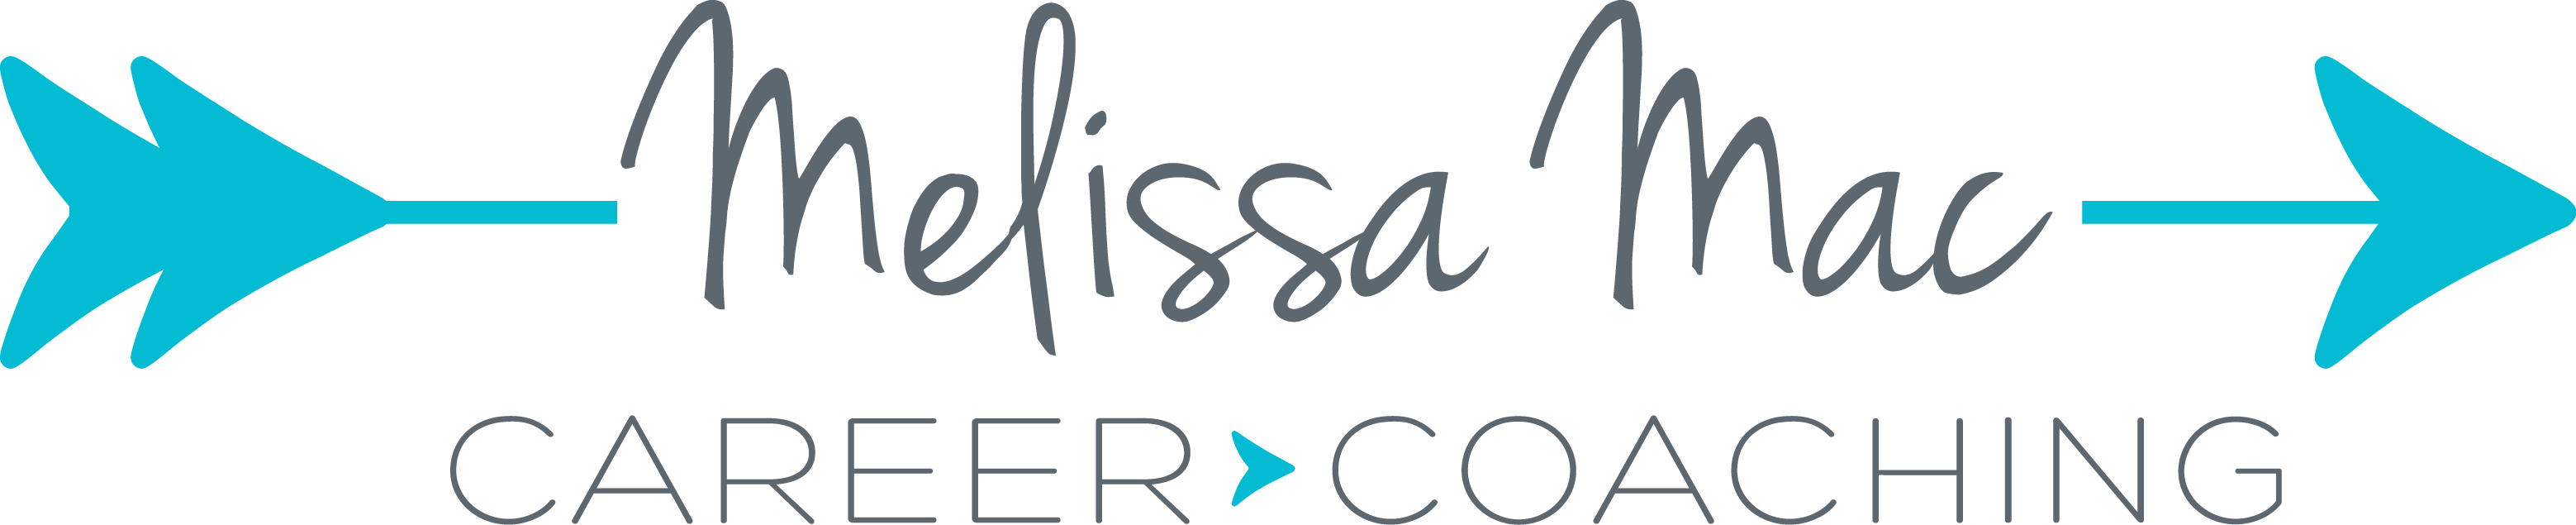 MelissaMacCareerCoaching